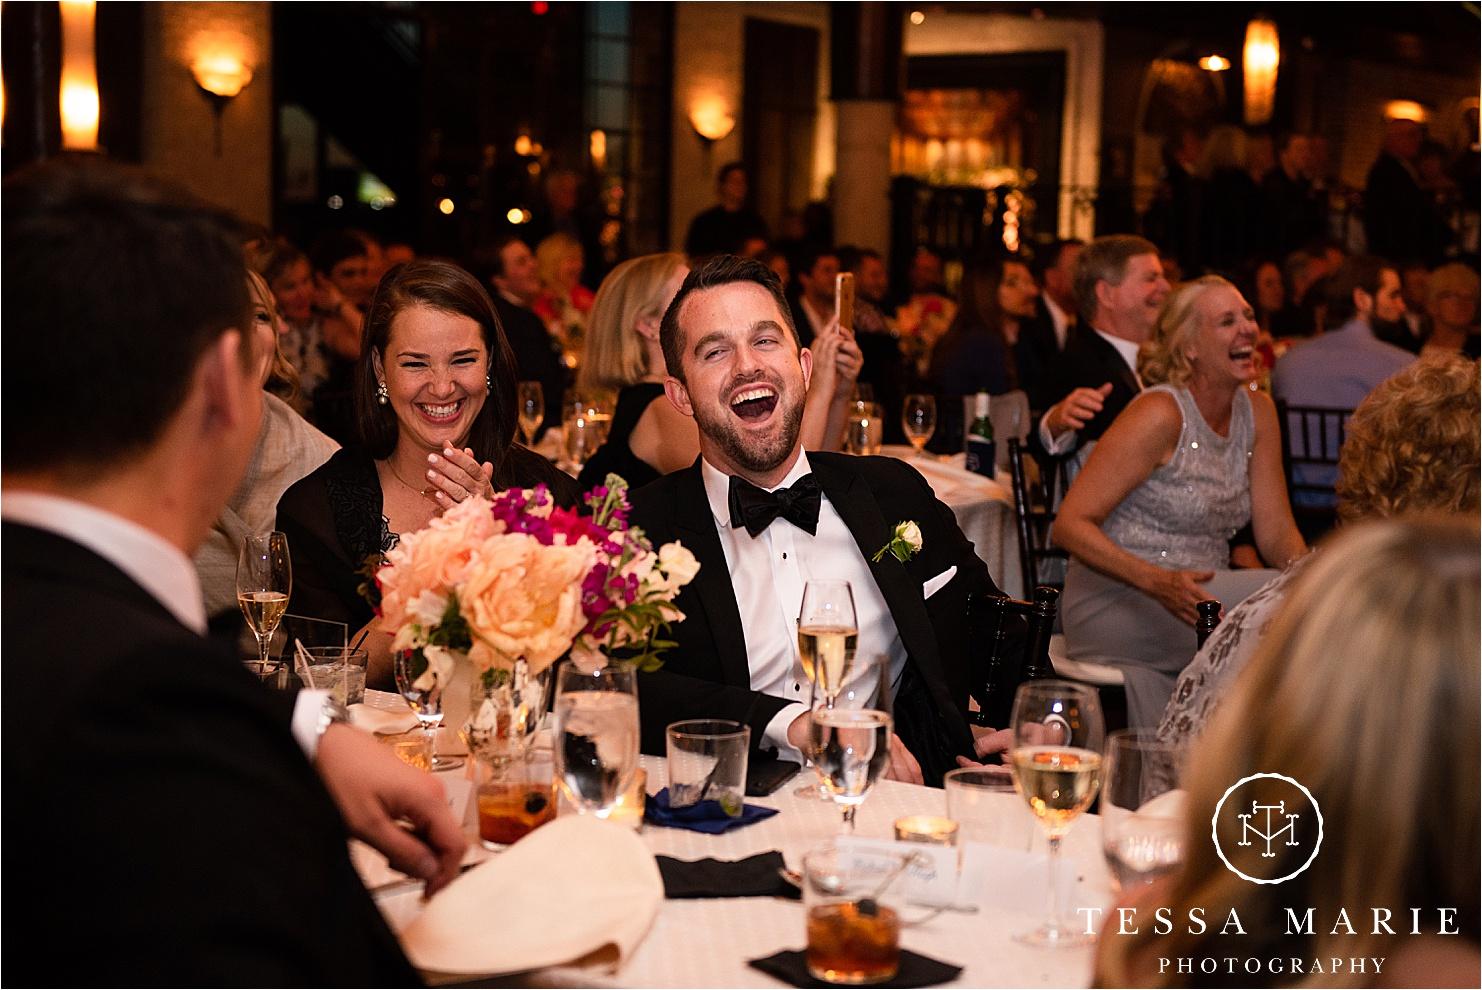 Tessa_marie_weddings_houston_wedding_photographer_The_astorian_0162.jpg